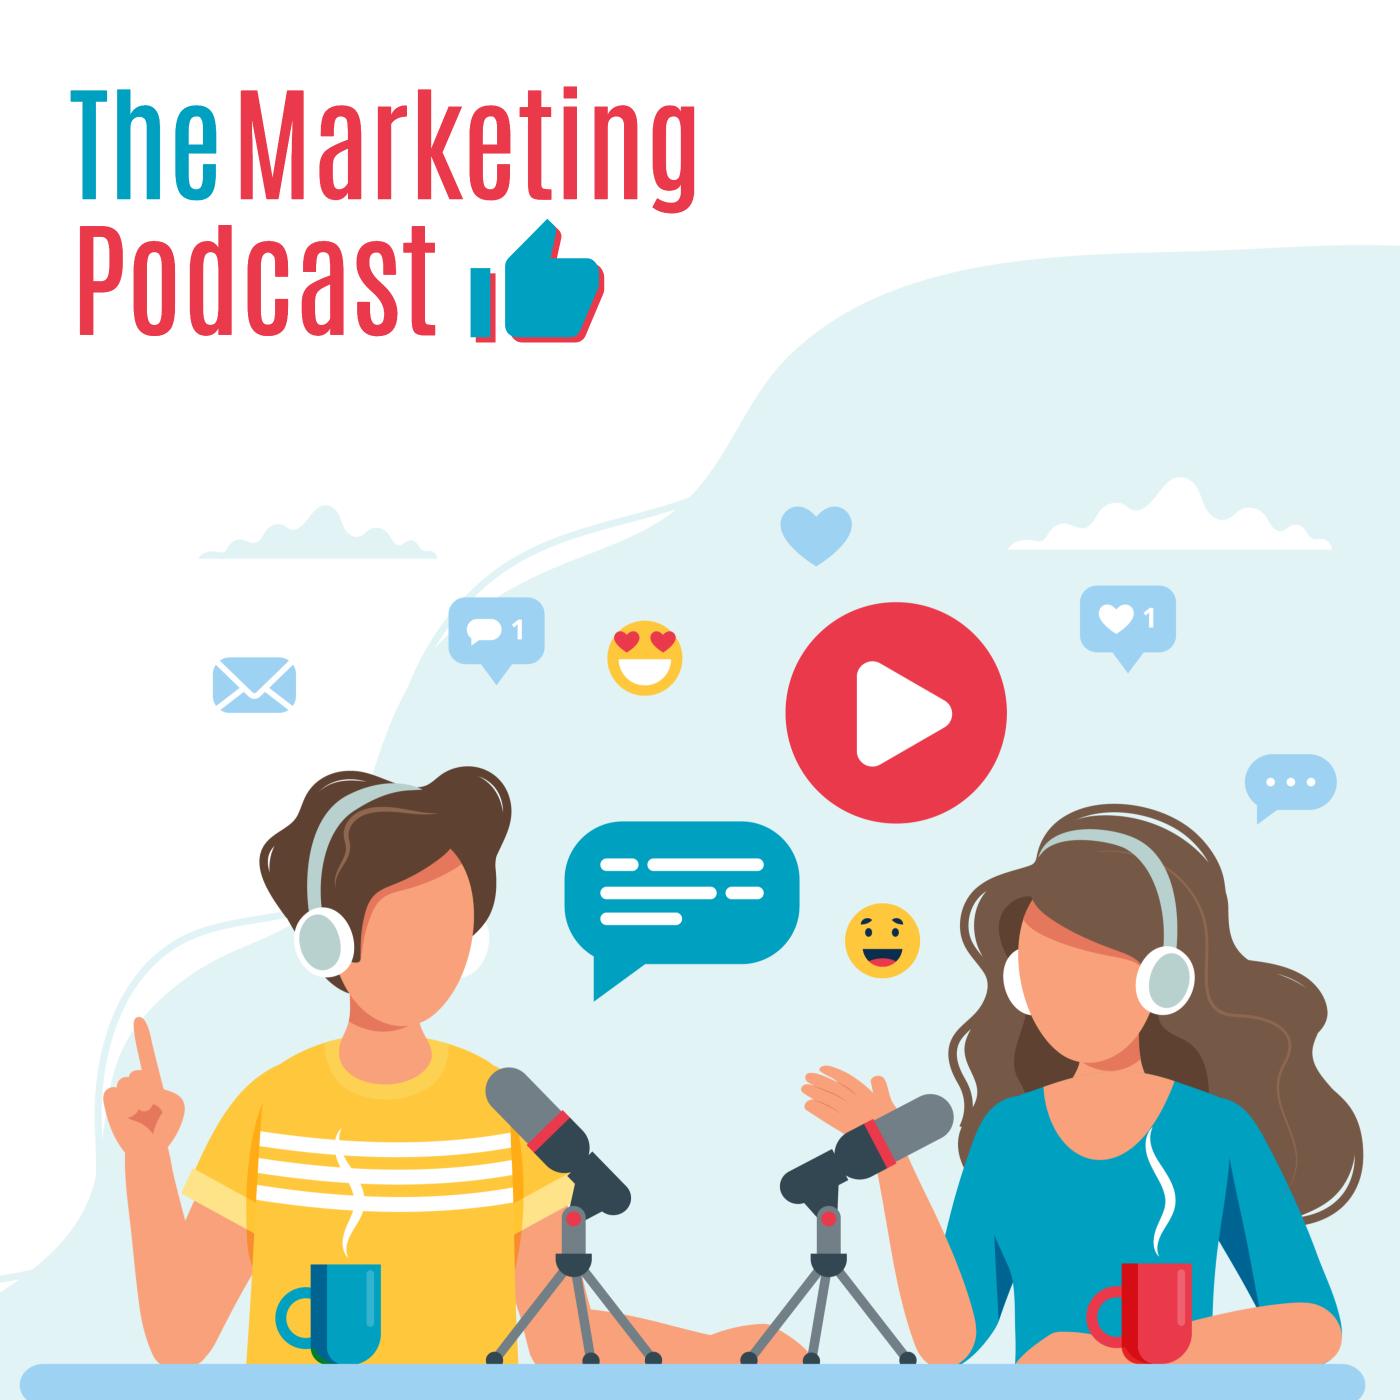 The Marketing Podcast